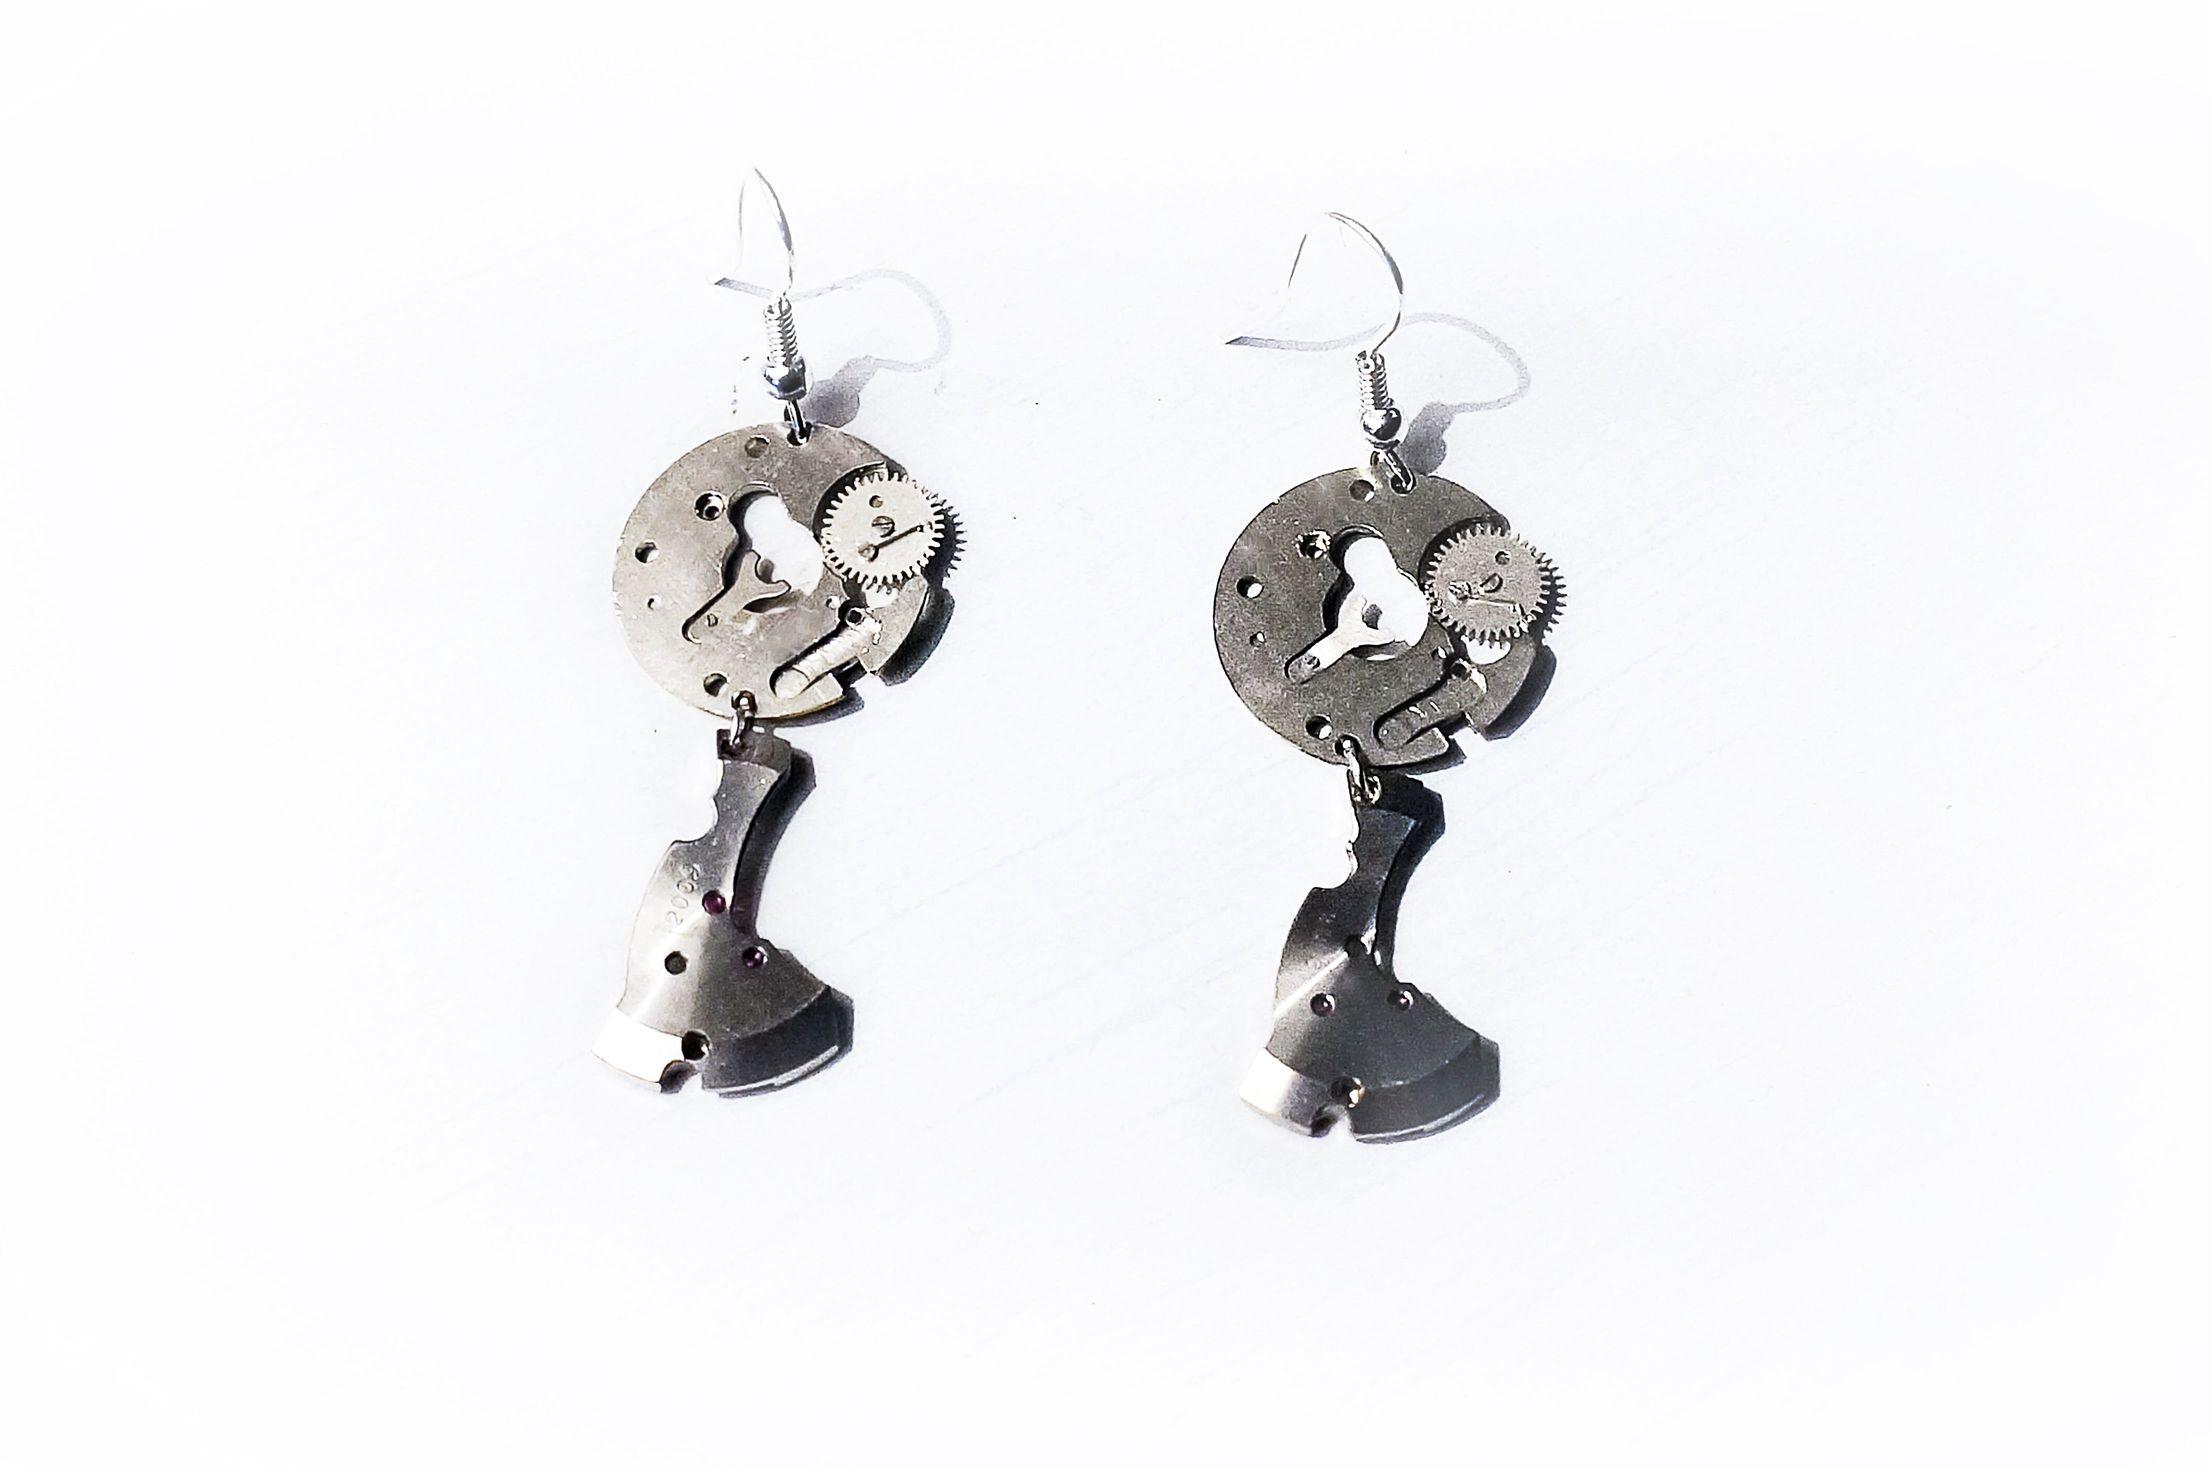 steampunk bdsm burning man earrings